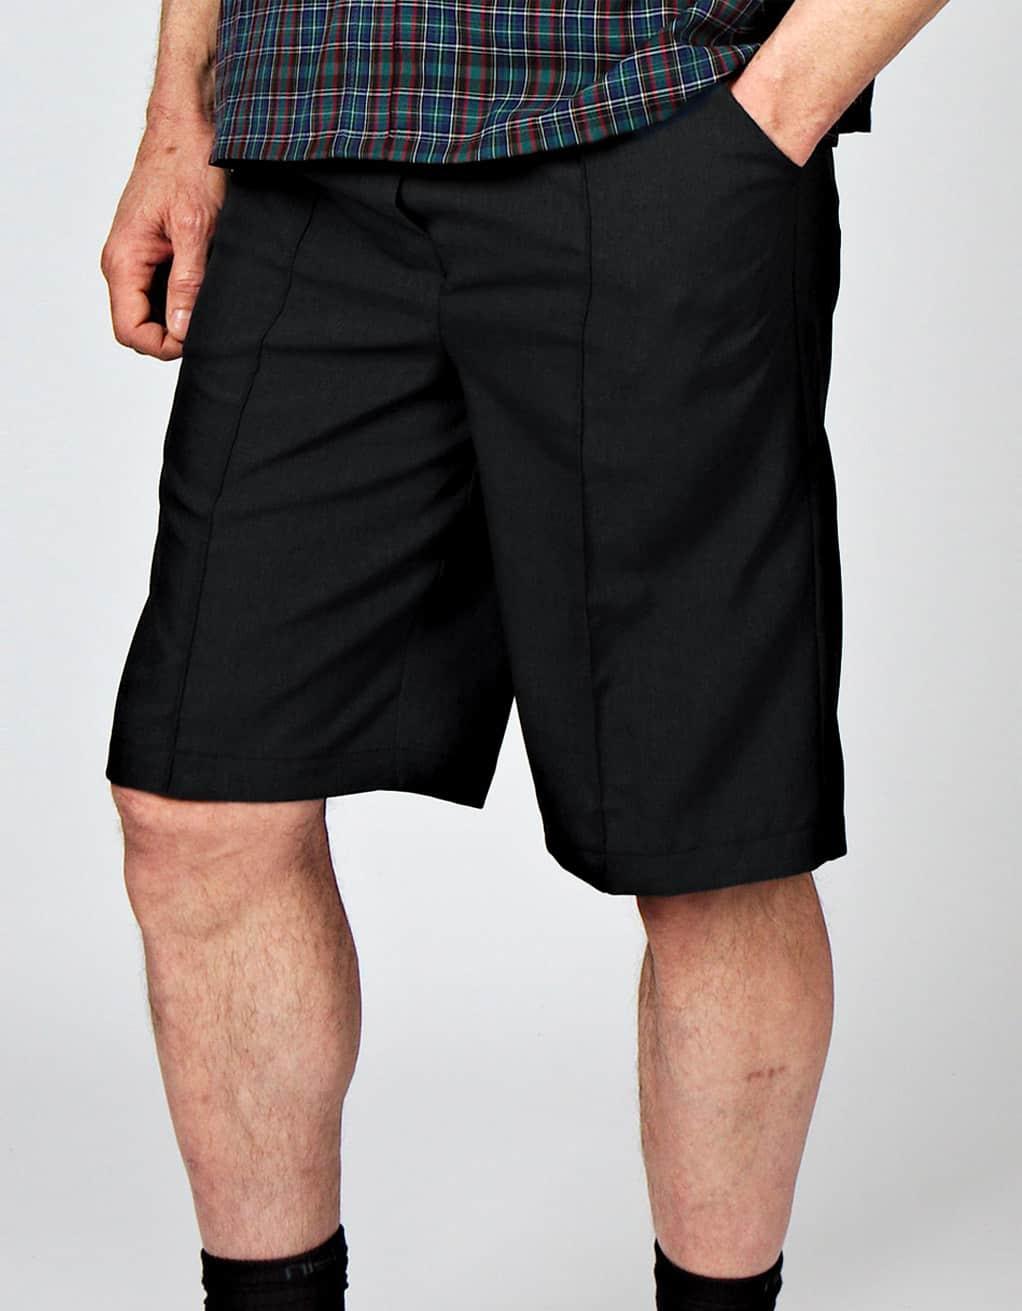 77088461f0d14 Elastic waist adaptive Bermuda shorts, with pockets and decorative ...